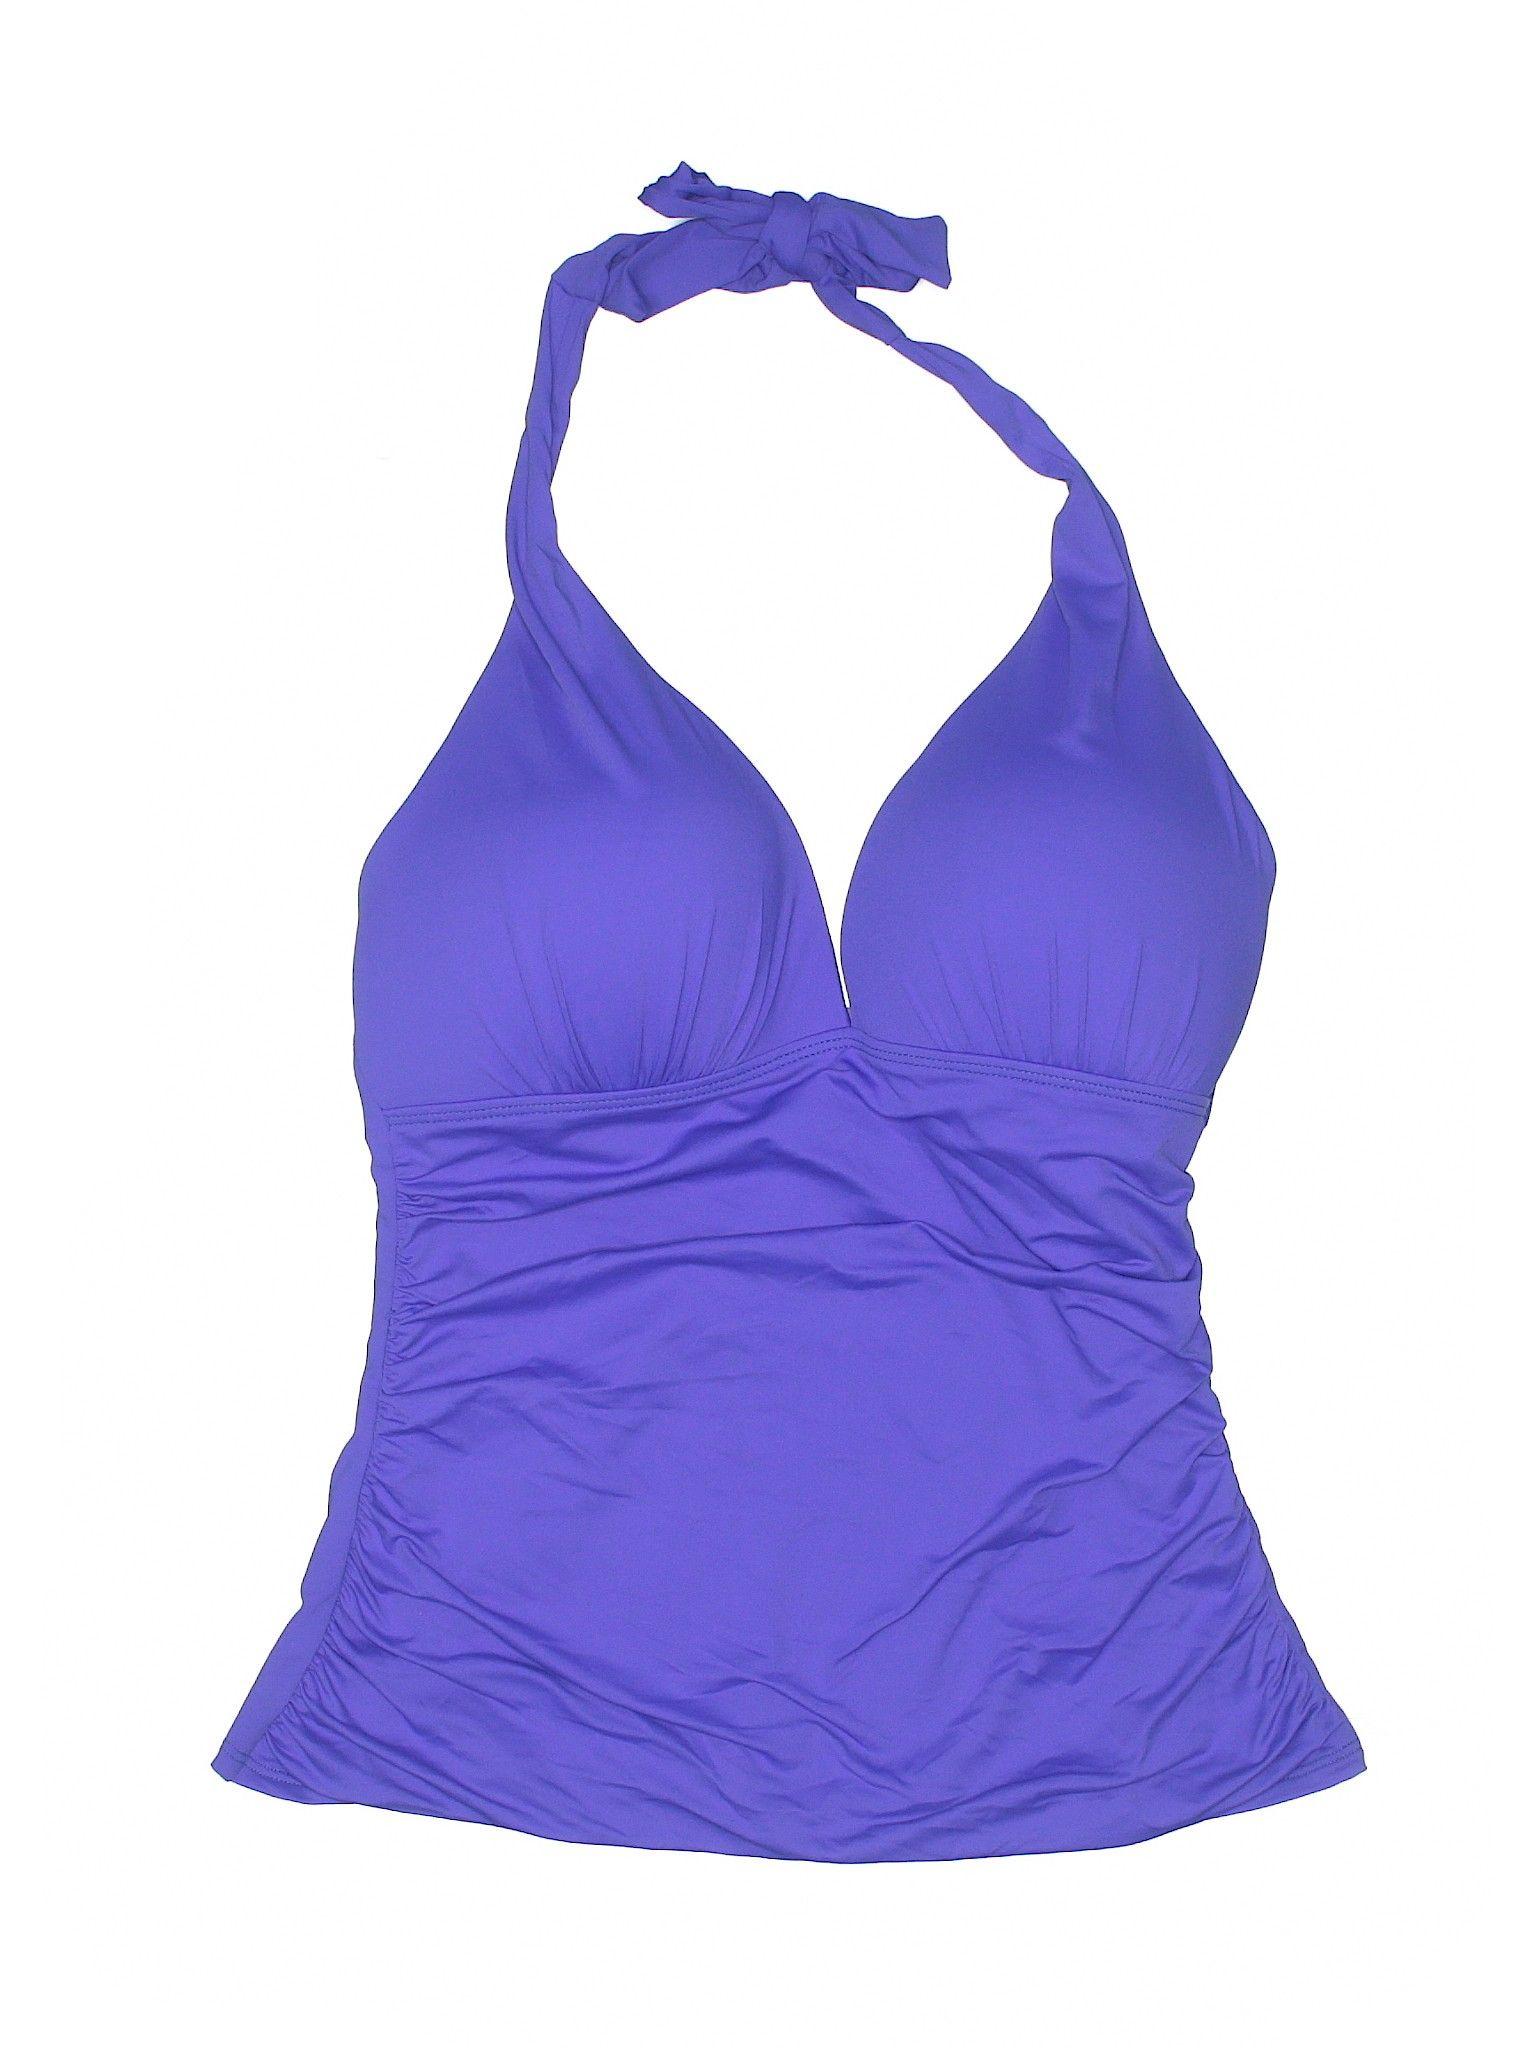 a6ed34a01097b Ralph Lauren Swimsuit Top: Size 10.00 Purple Women's Swimwear - New With  Tags - $23.99